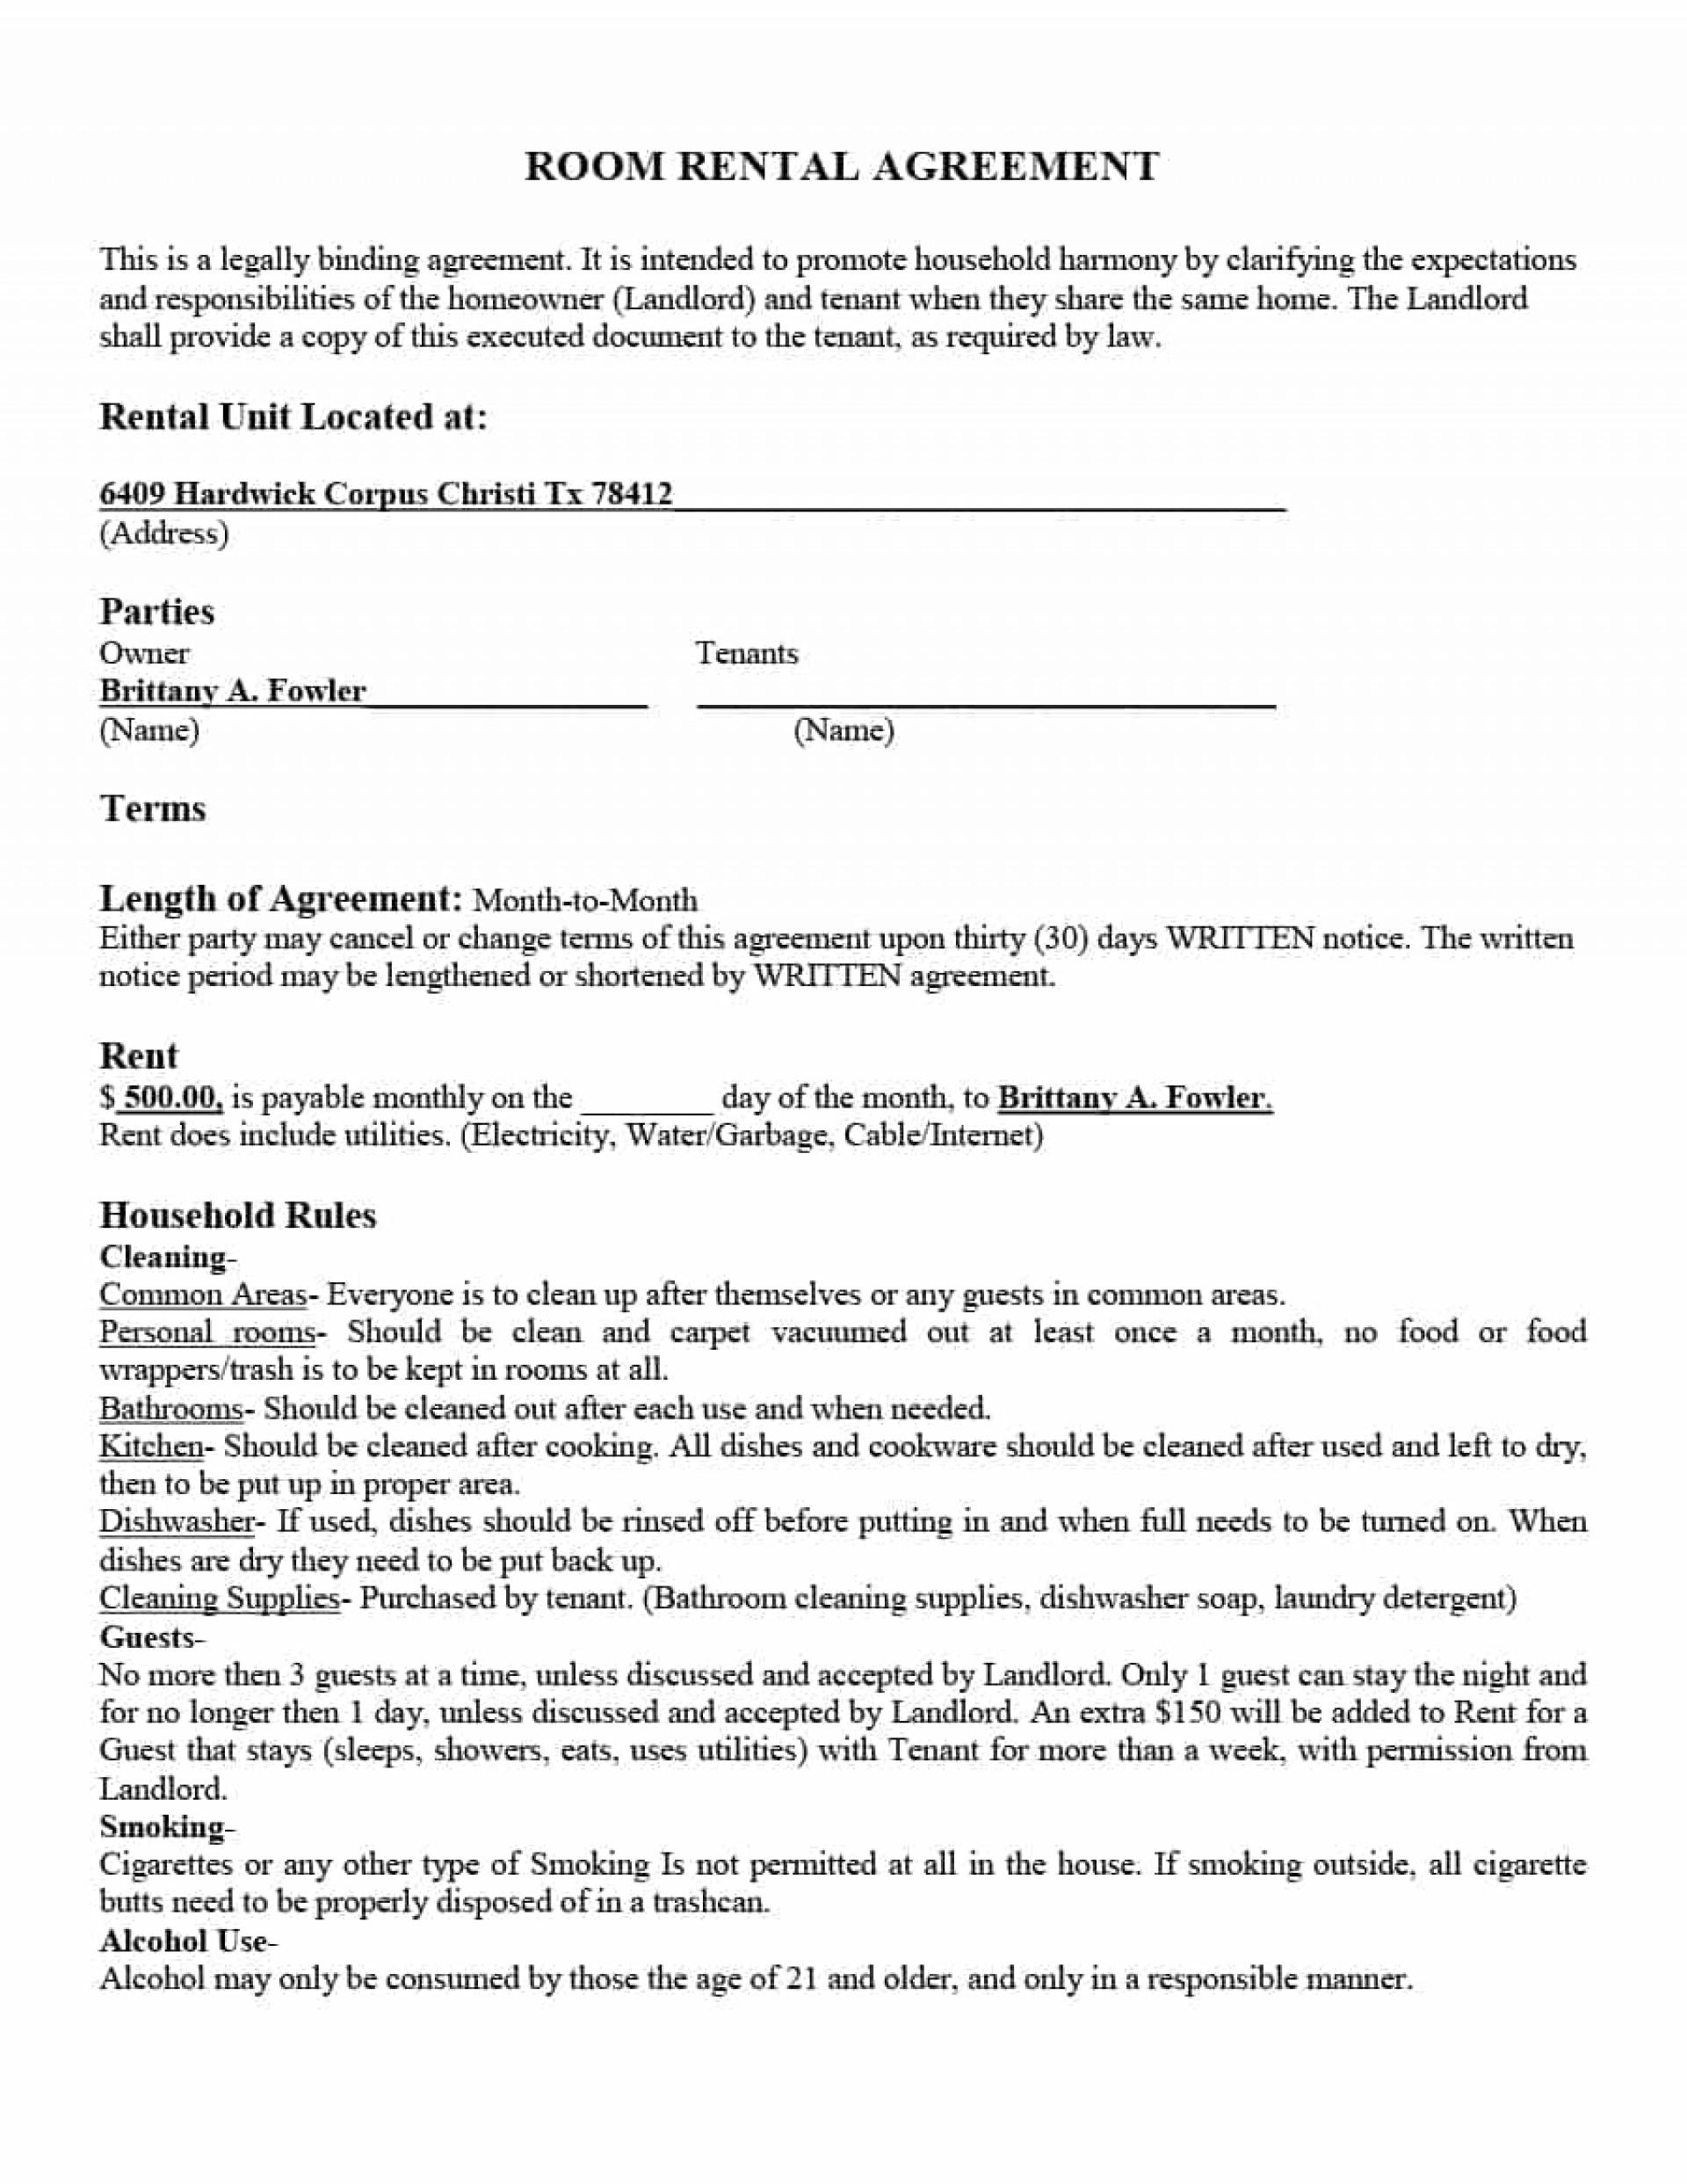 Room Rental Agreement Template Sample  Word Doc Malaysia Singapore Pdf1920